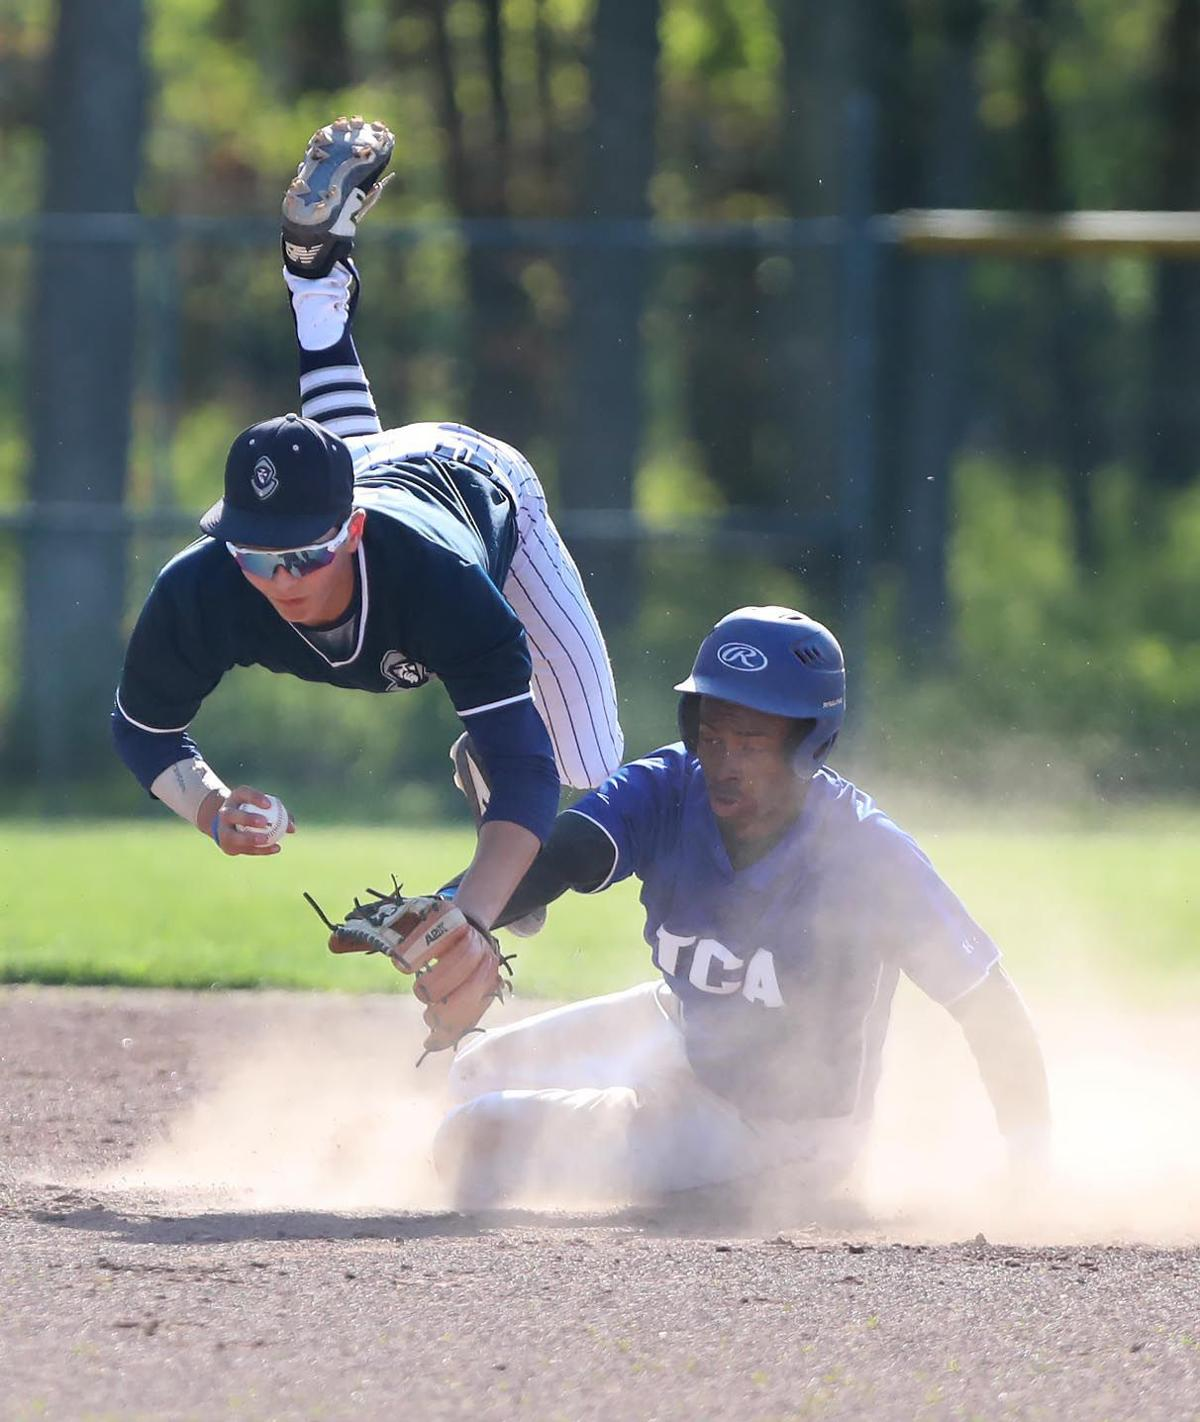 St. Augustine vs. Trenton Catholic Diamond Classic baseball game